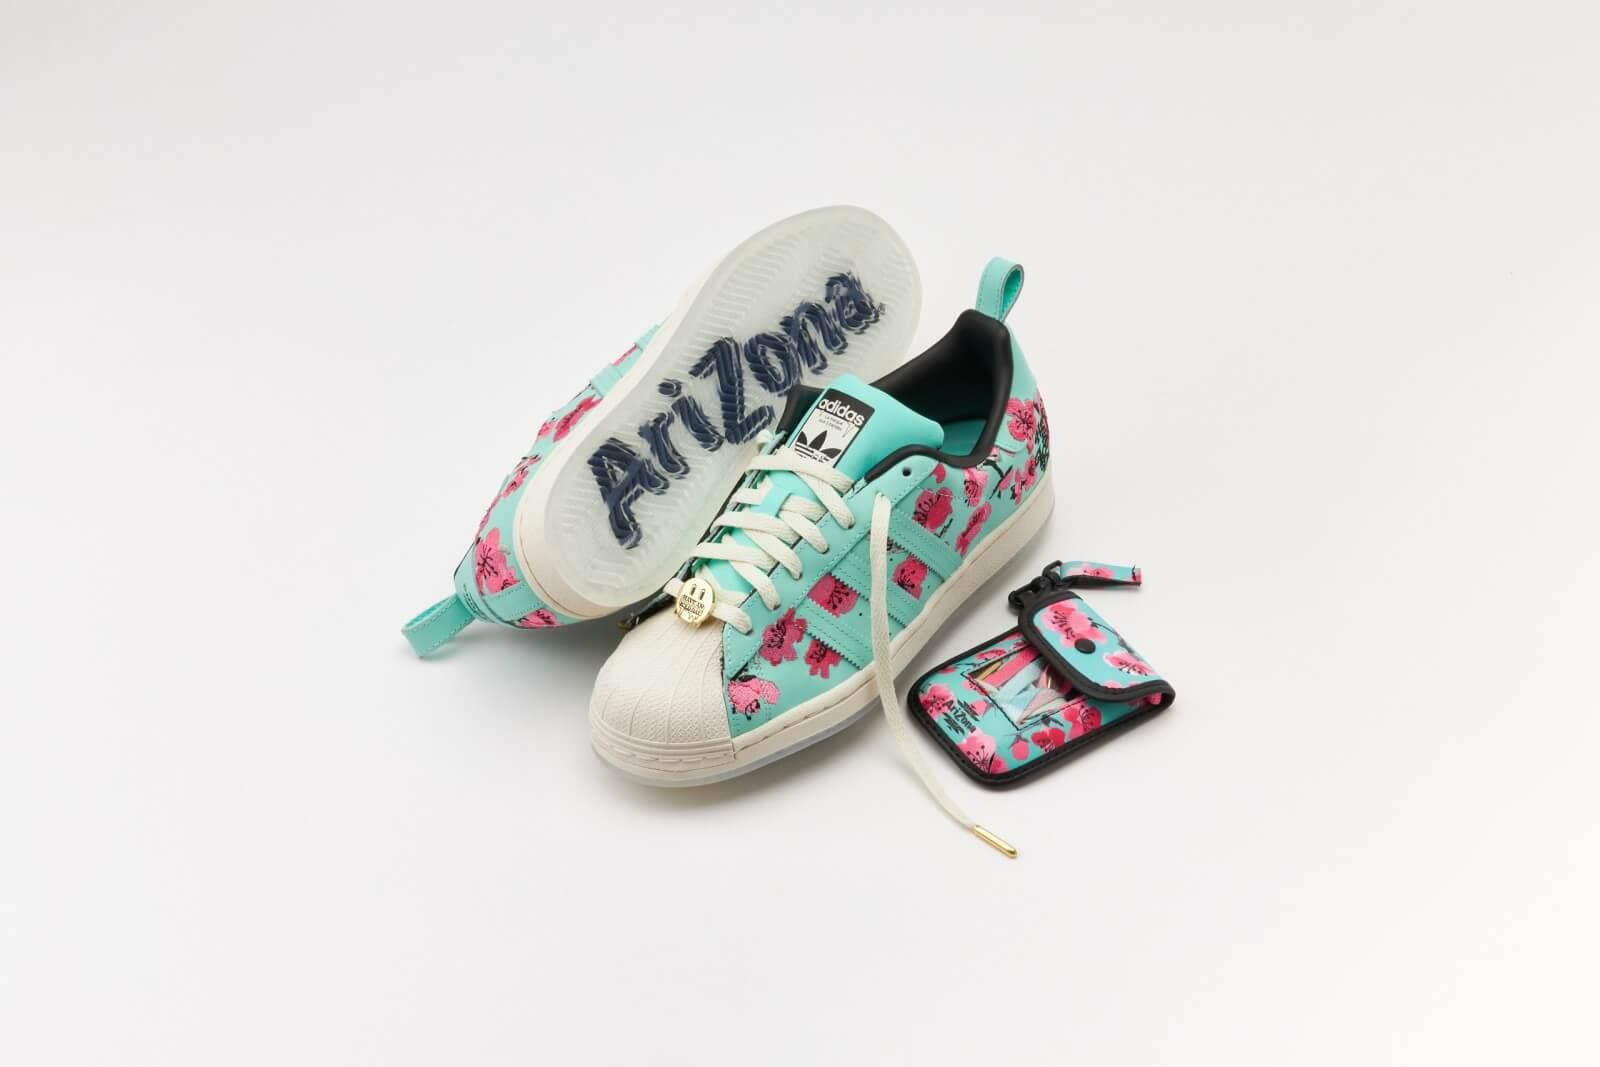 Adidas x Arizona Iced Tea Superstar Chalk White